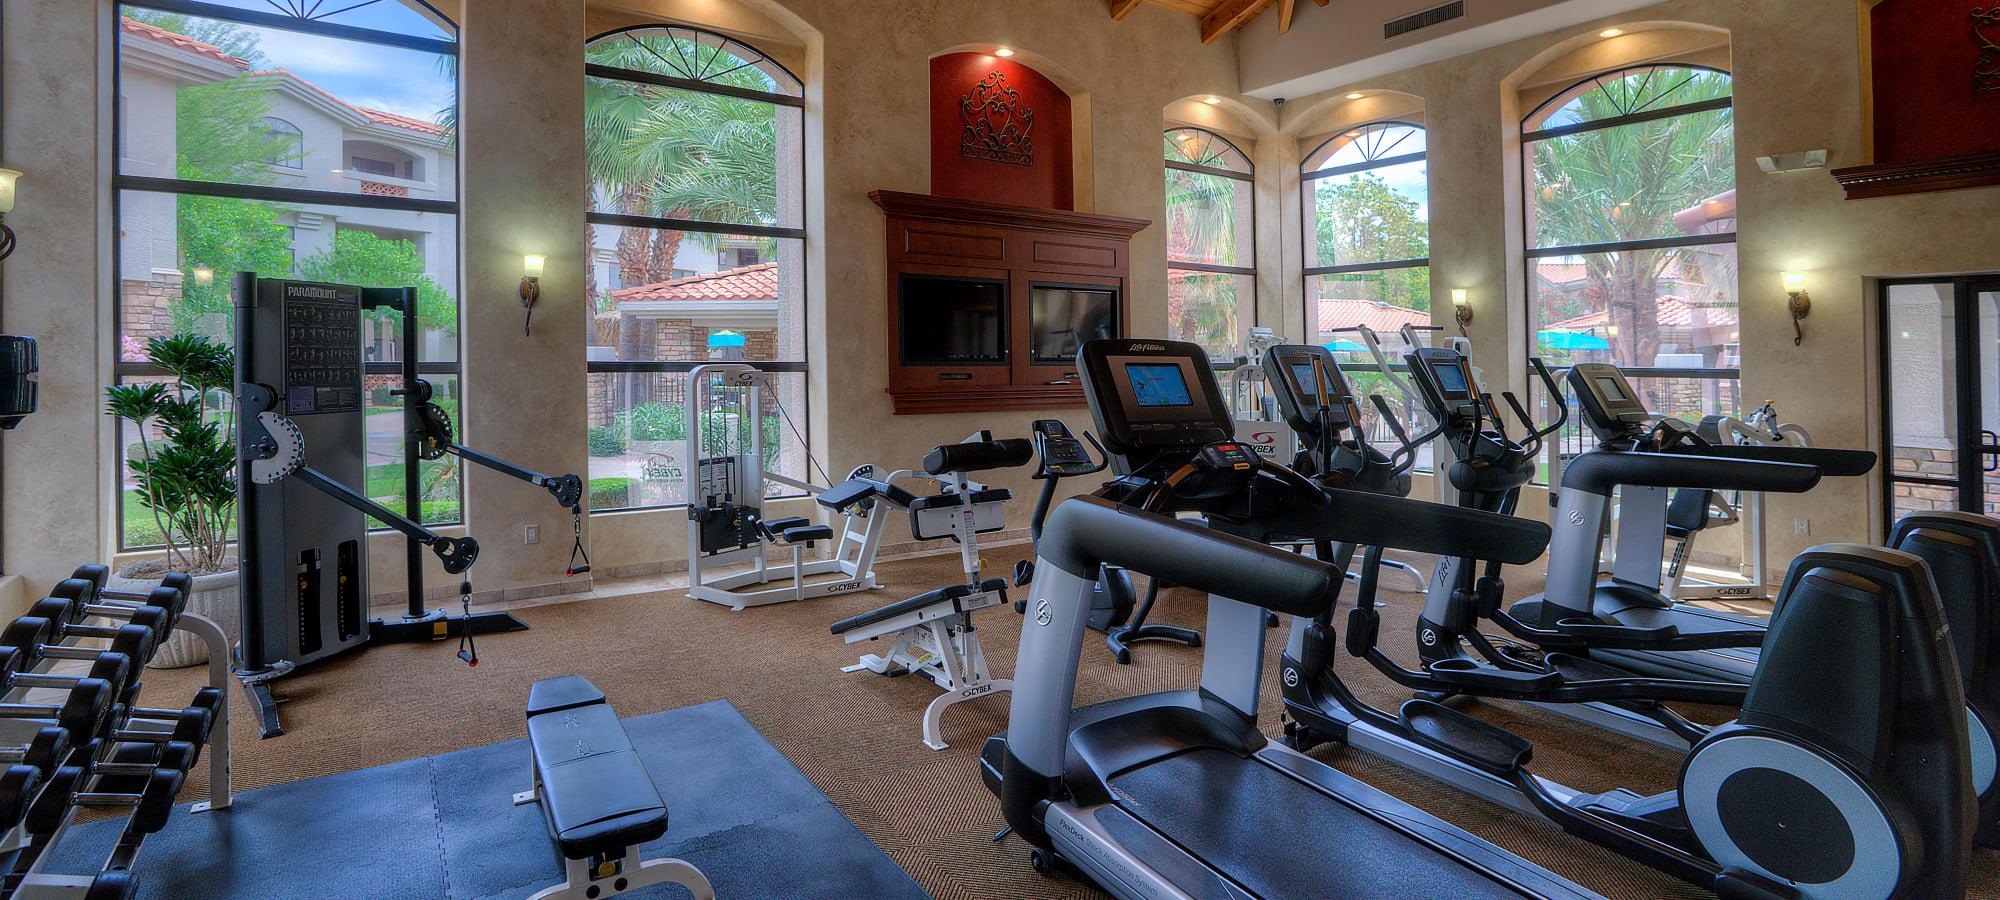 Fitness center at San Hacienda in Chandler, Arizona